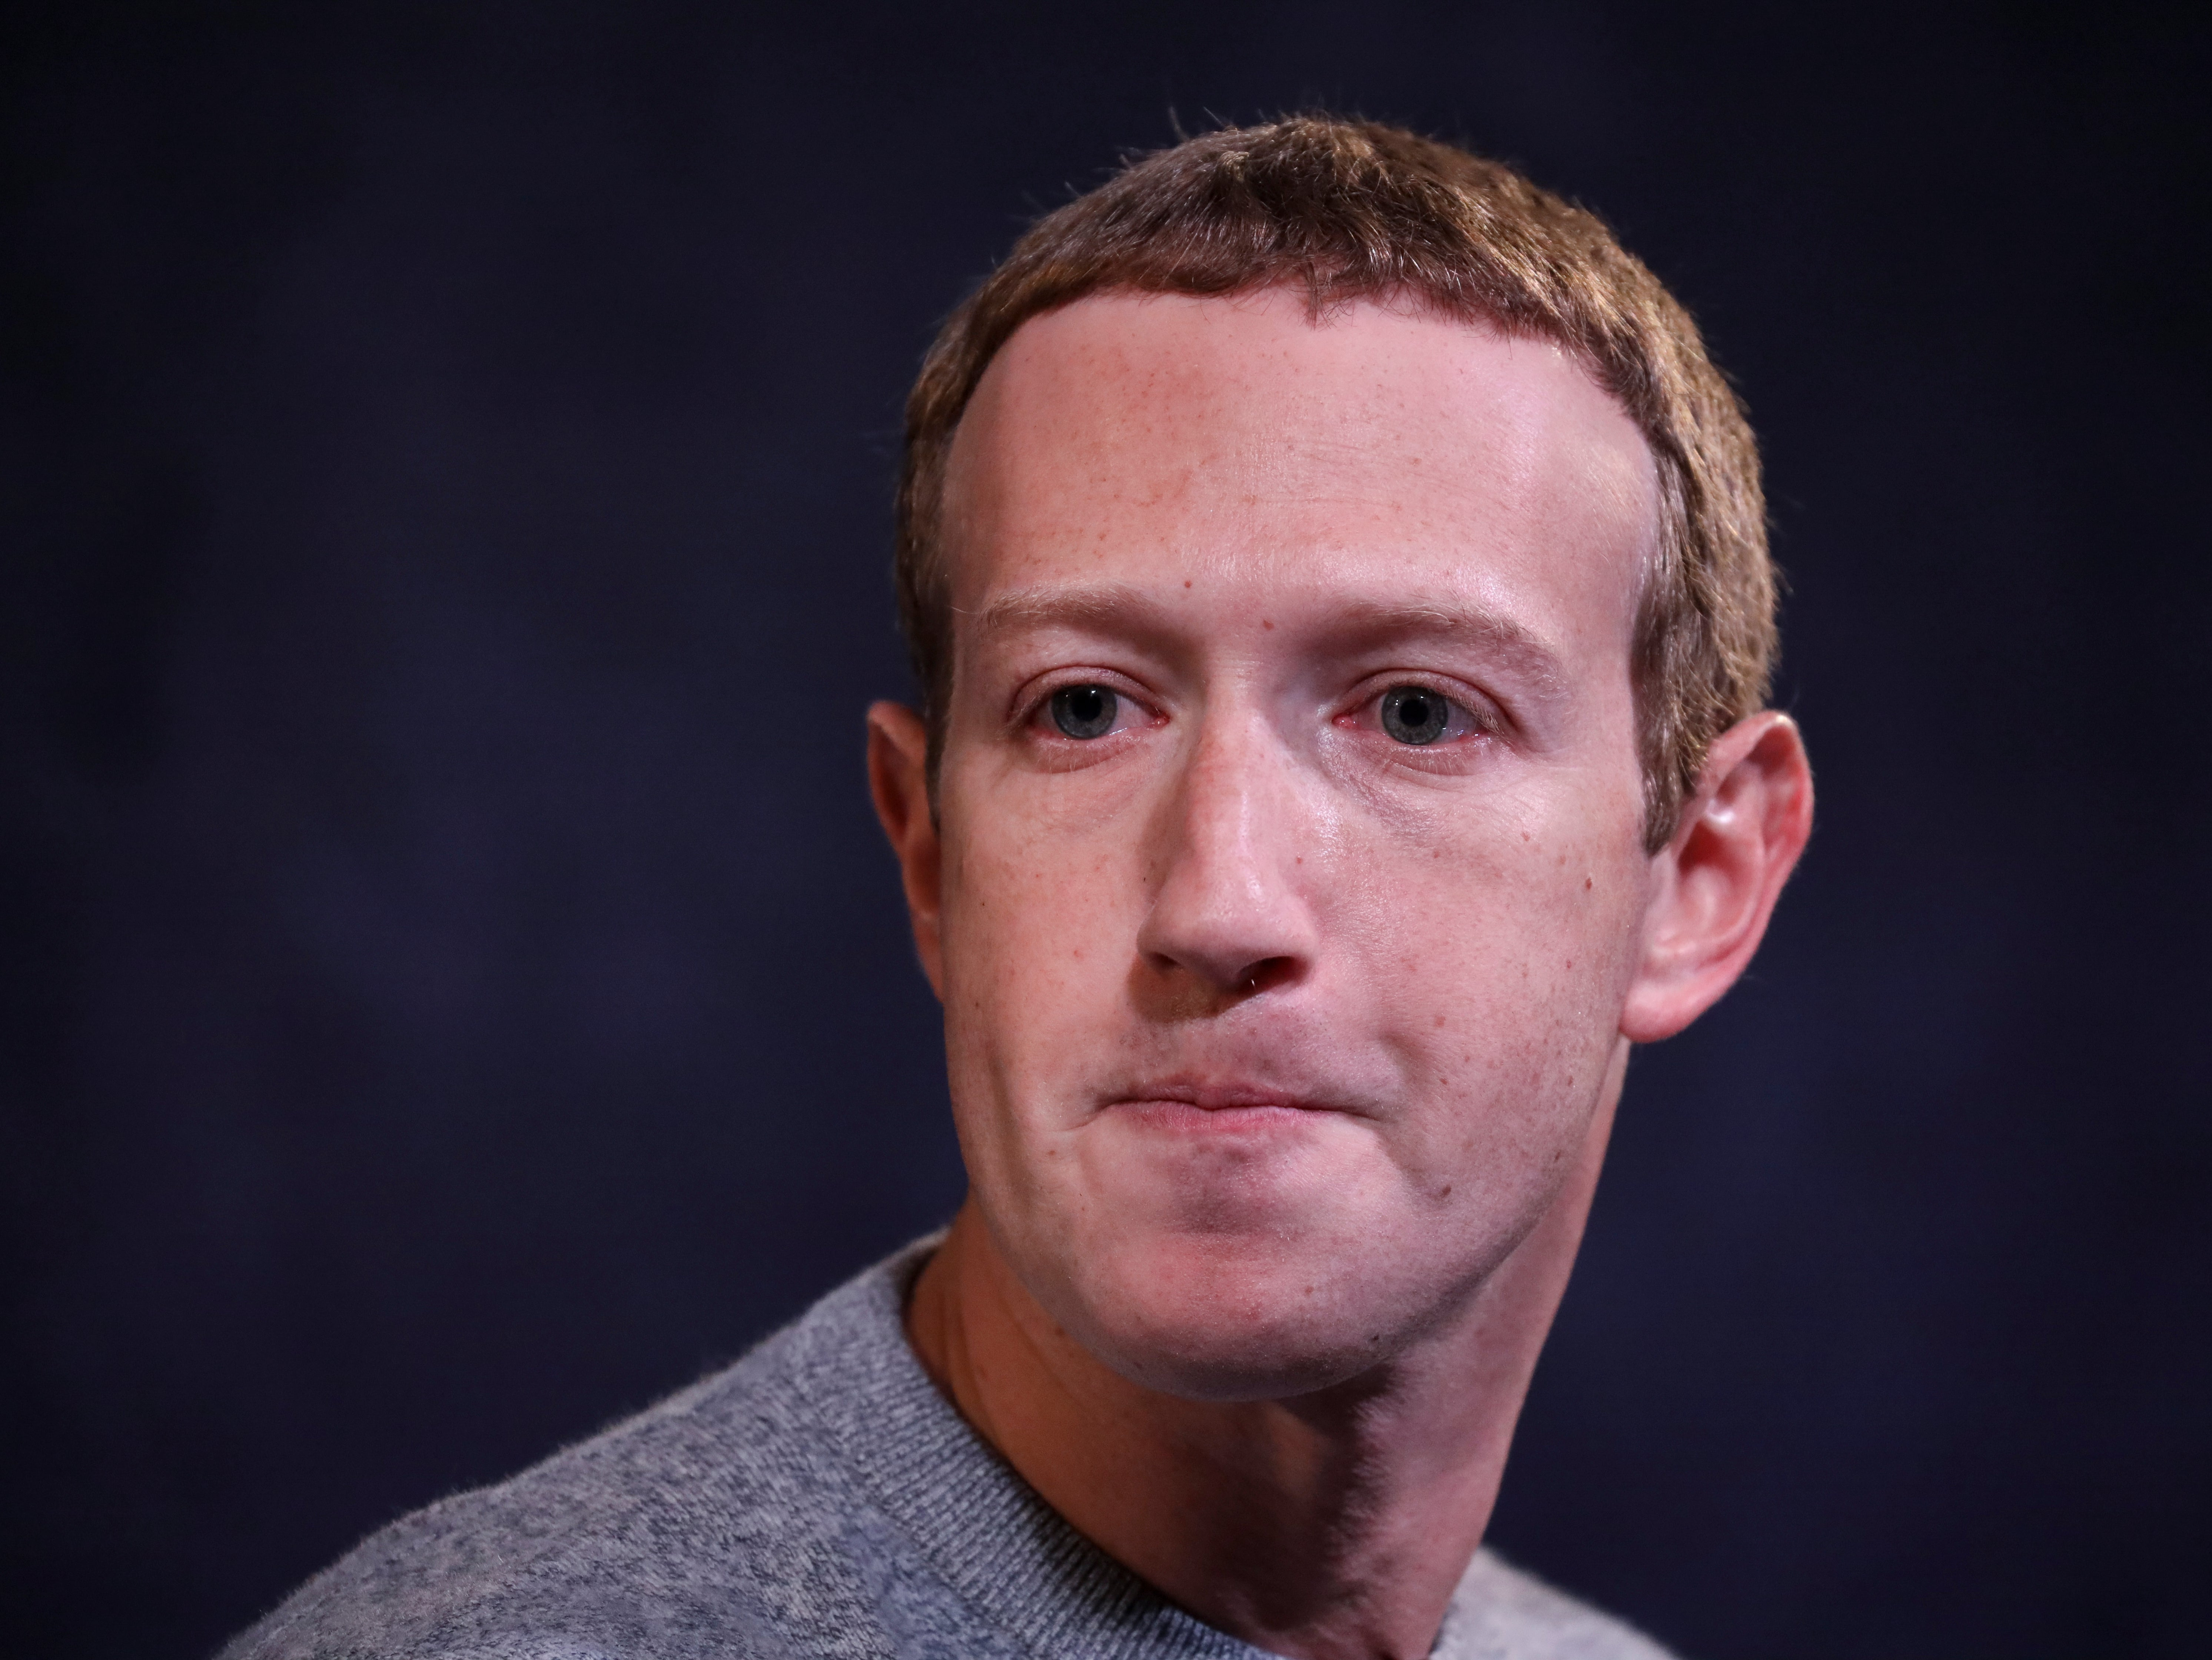 Zuckerberg will permanently depoliticise Facebook following violence organised on platform